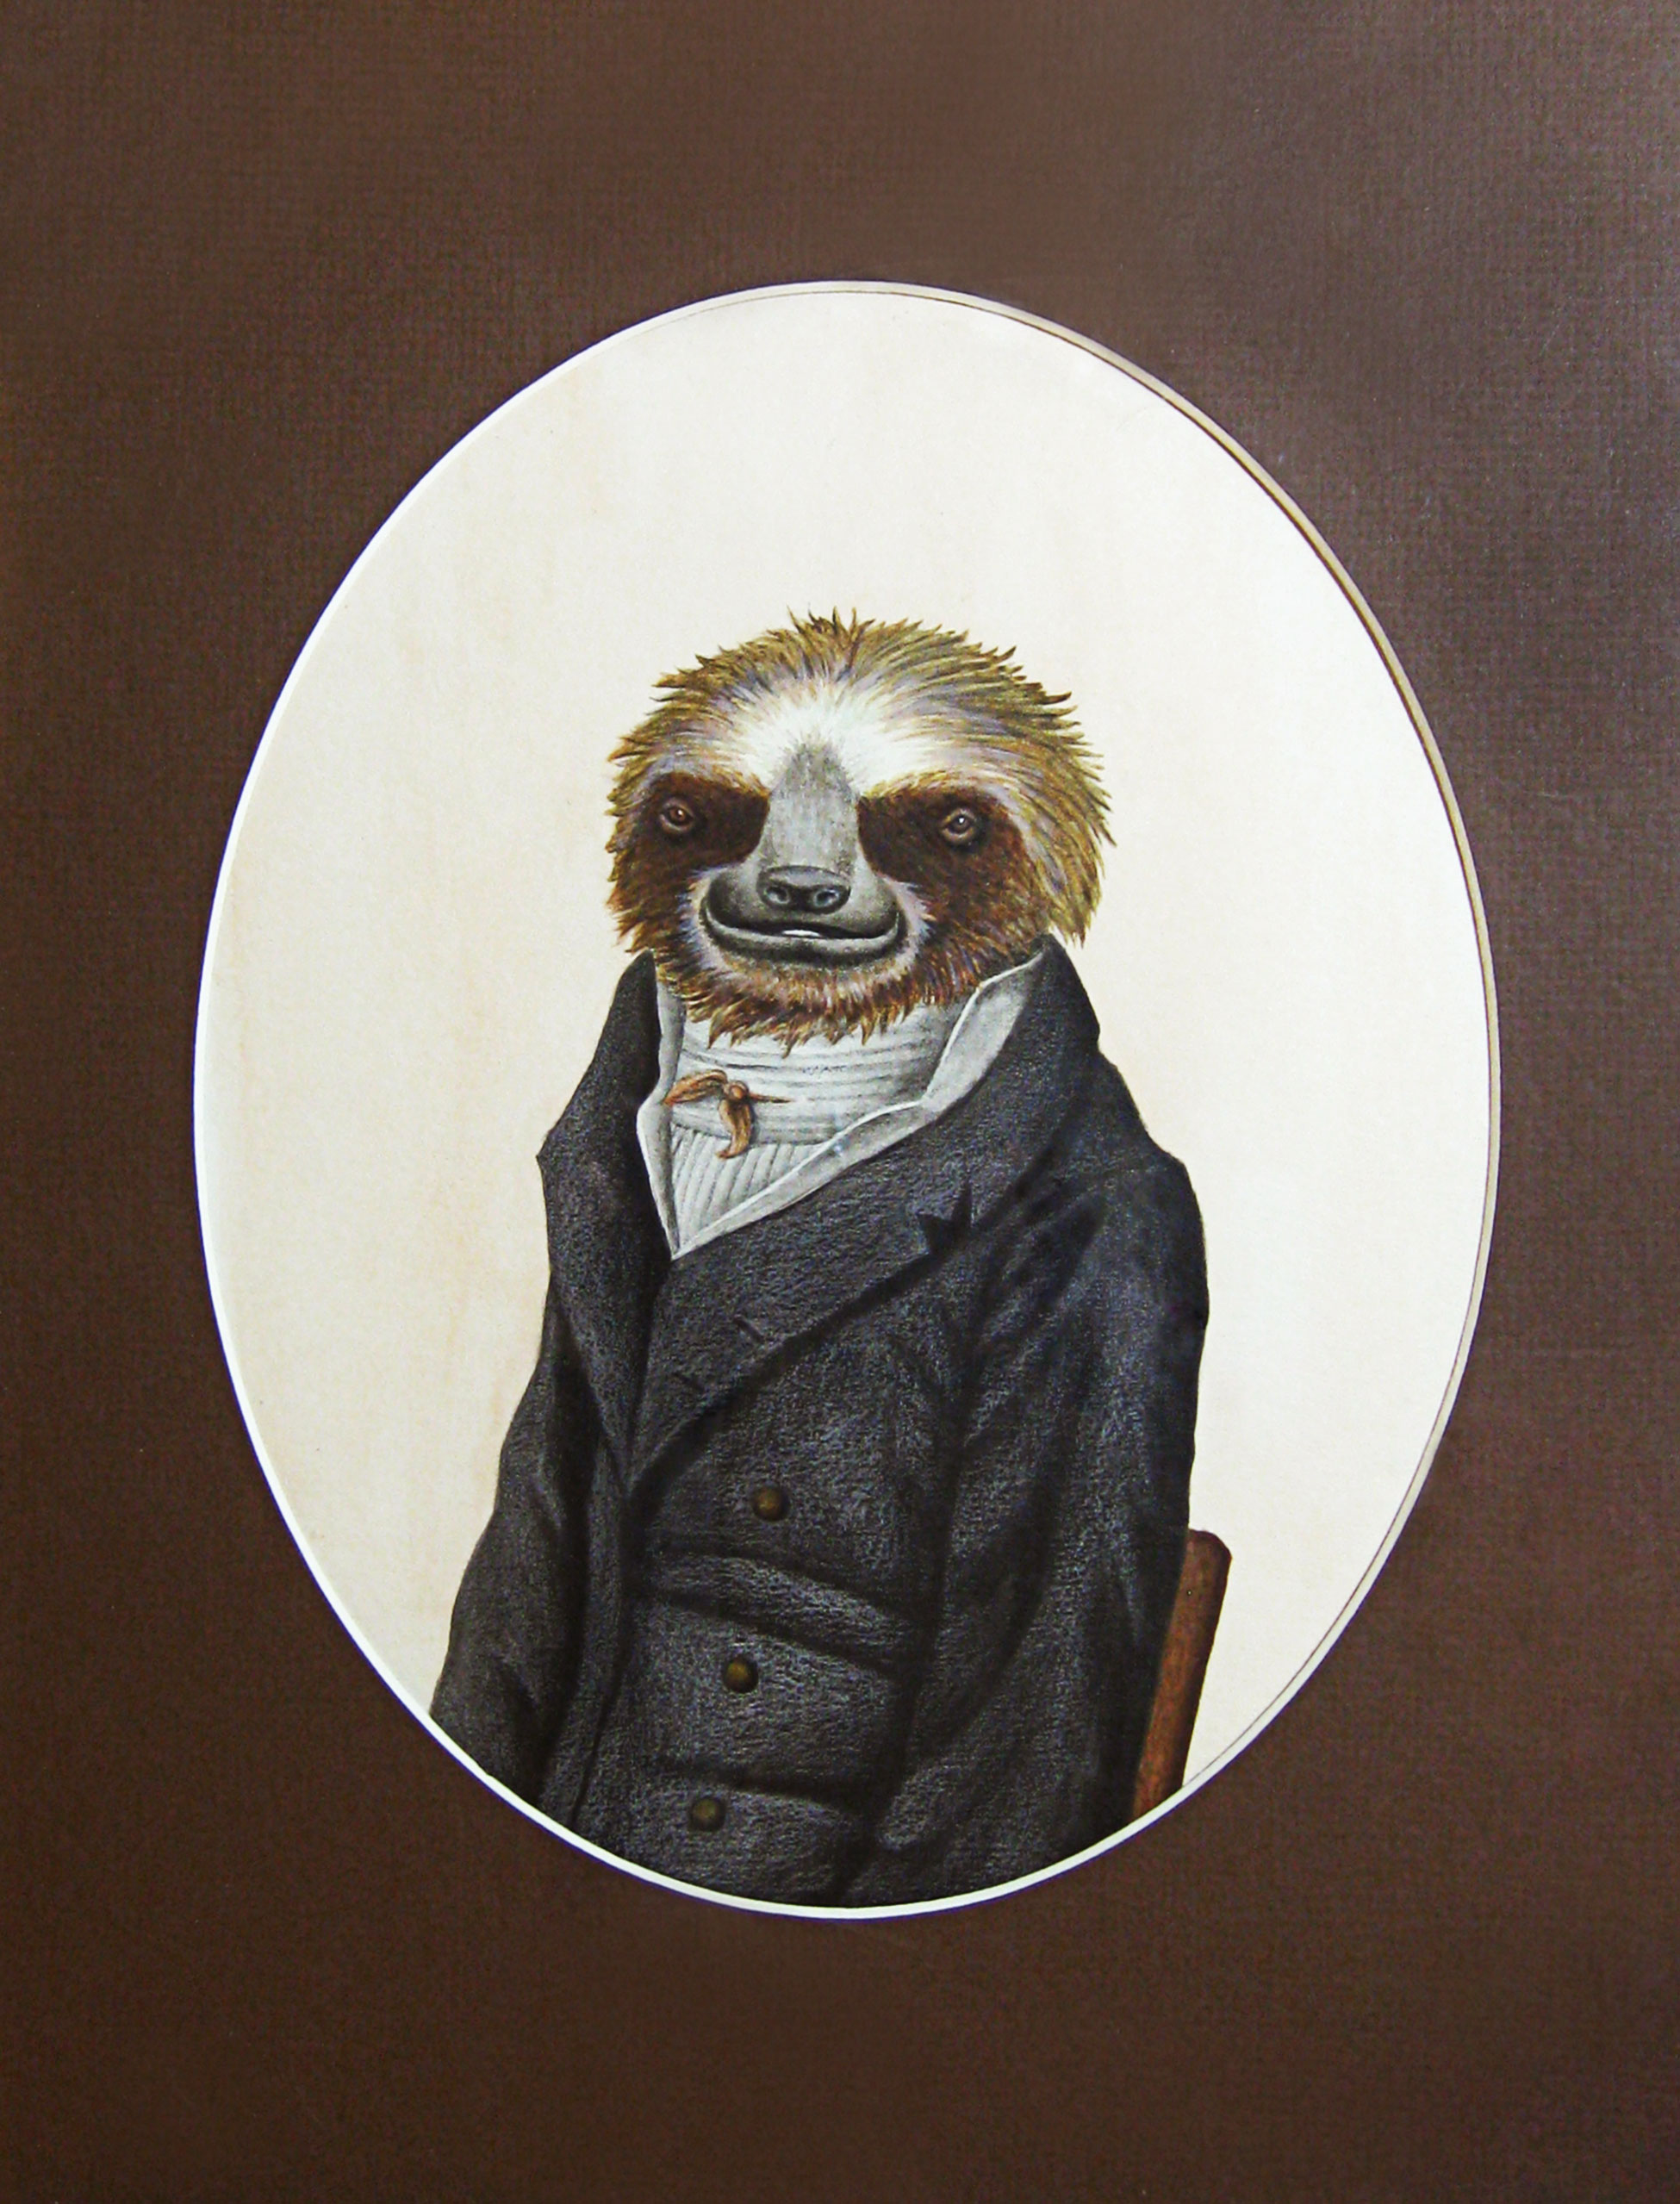 Sir Sloth